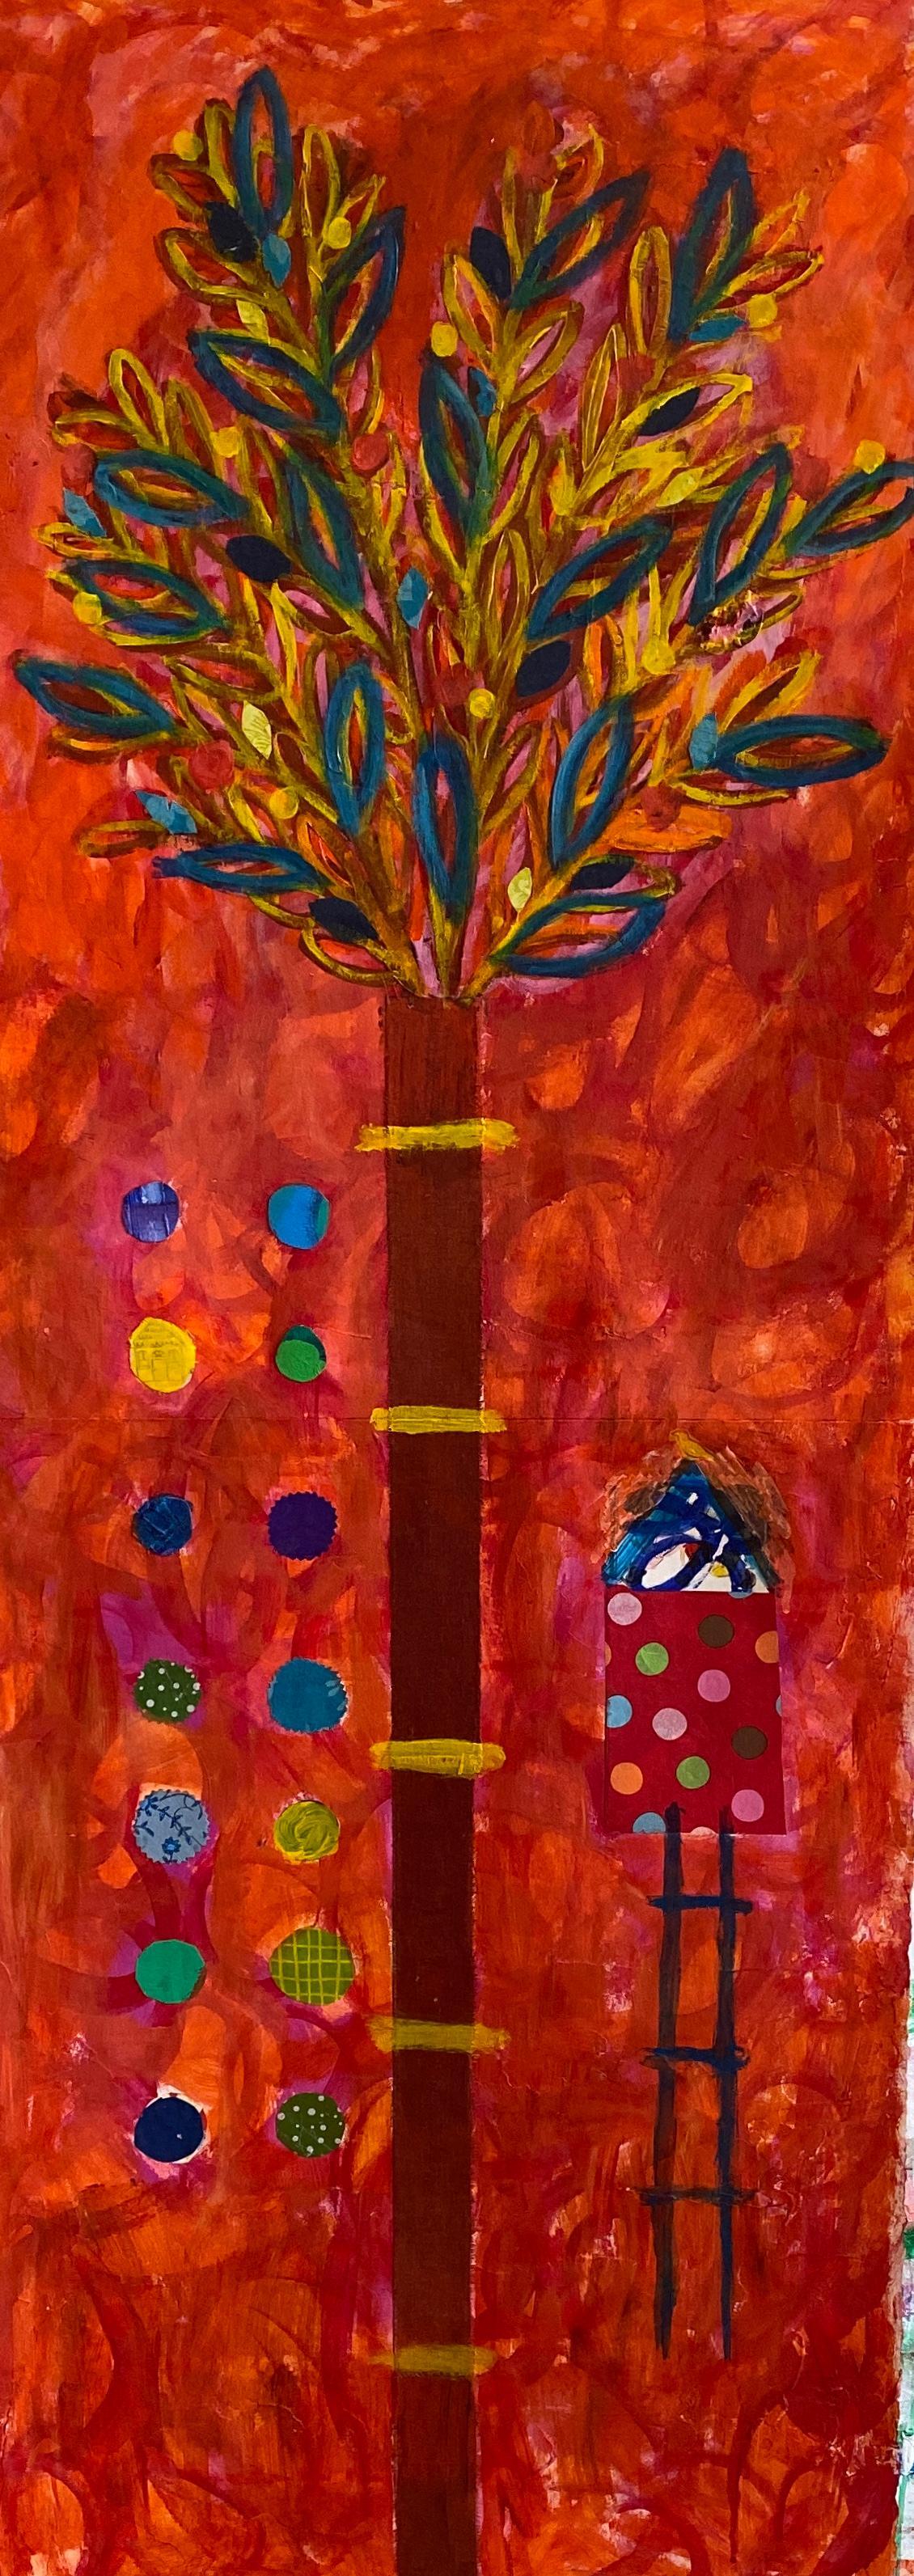 Contemporary Orange Tree of Life Mixed Media Acrylic Painting on Paper